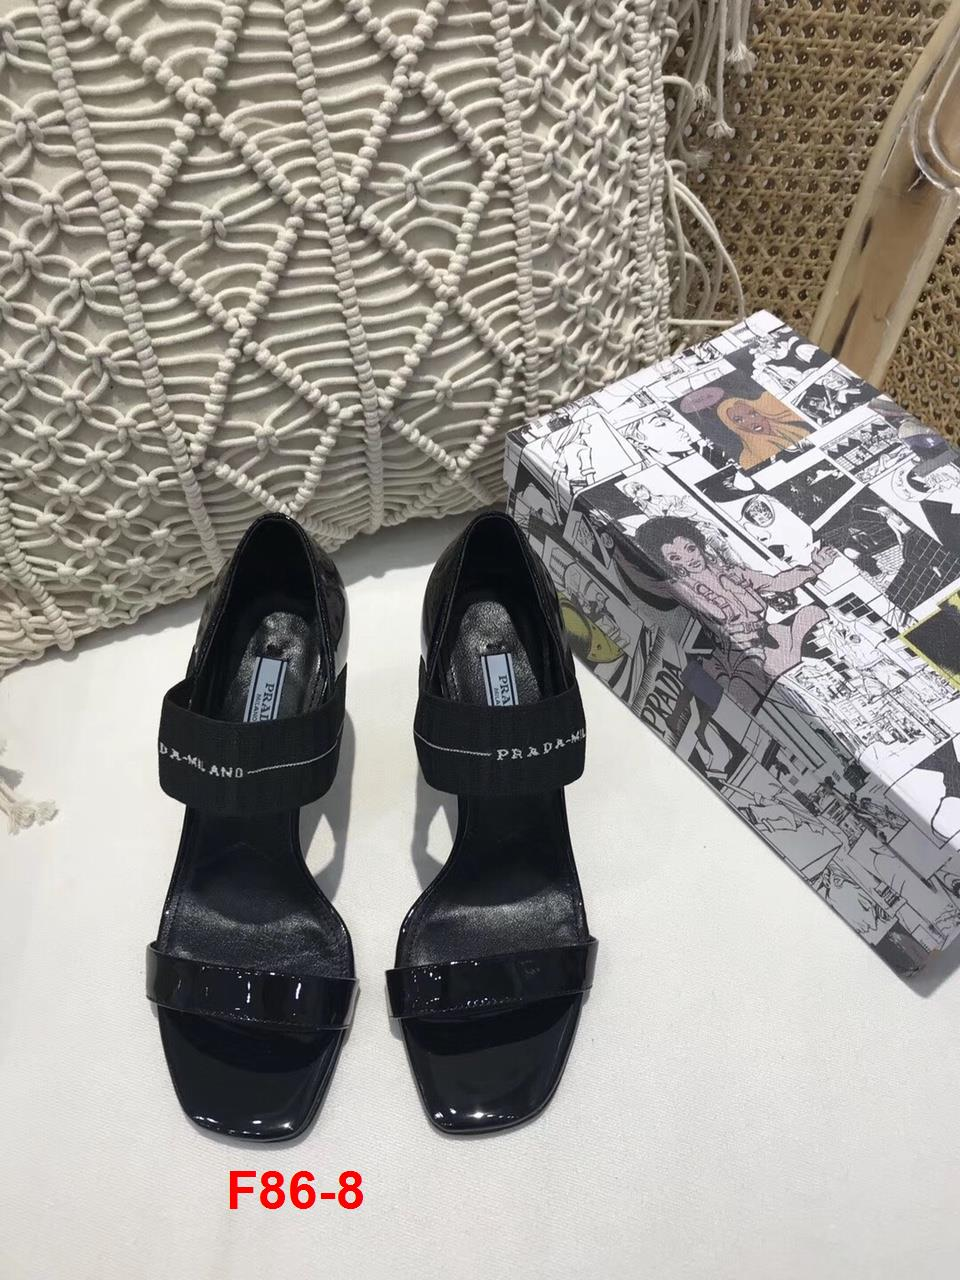 F86-8 Prada sandal cao 9cm siêu cấp